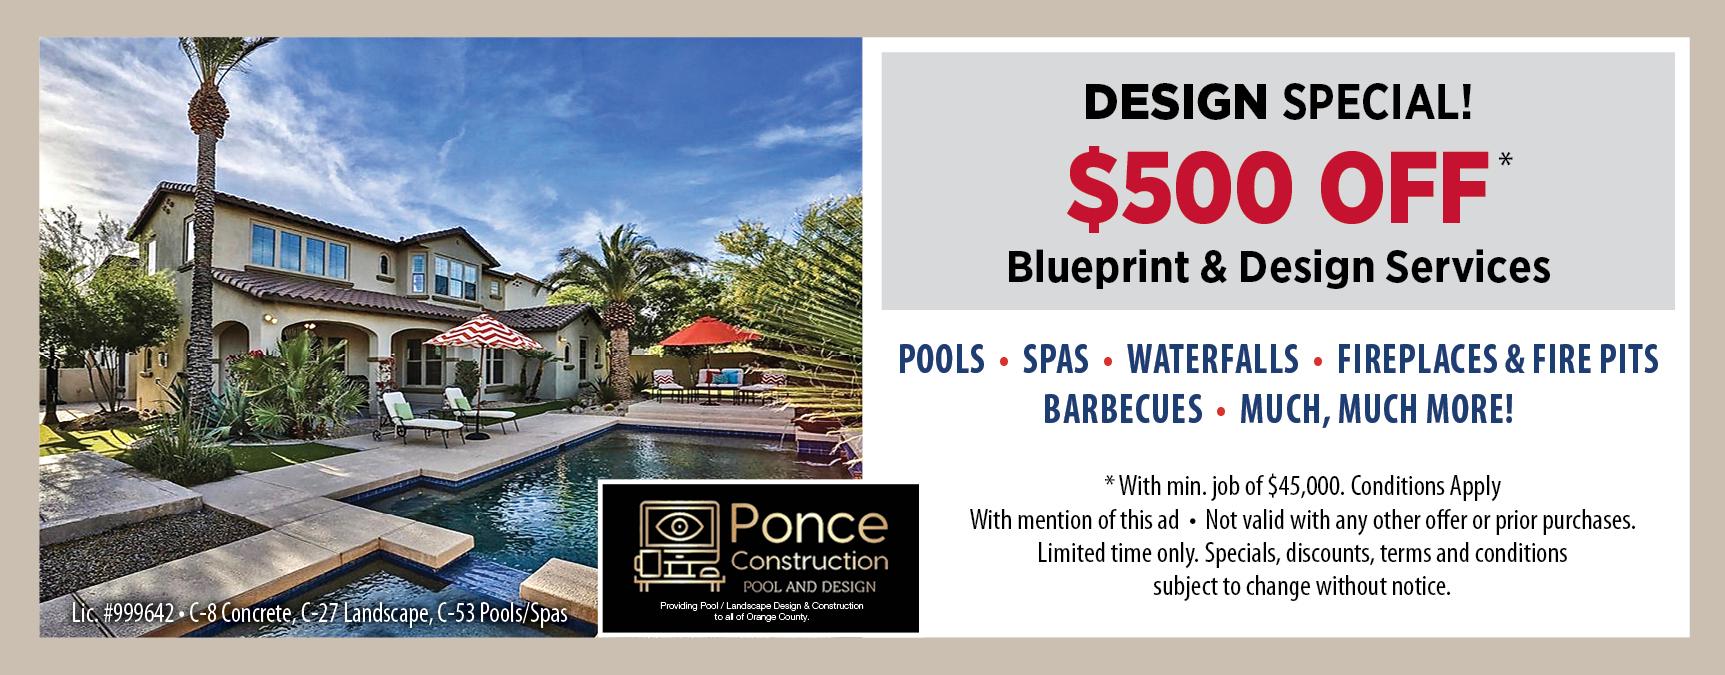 Ponce Construction_Offer_Reg-2_09-19.jpg